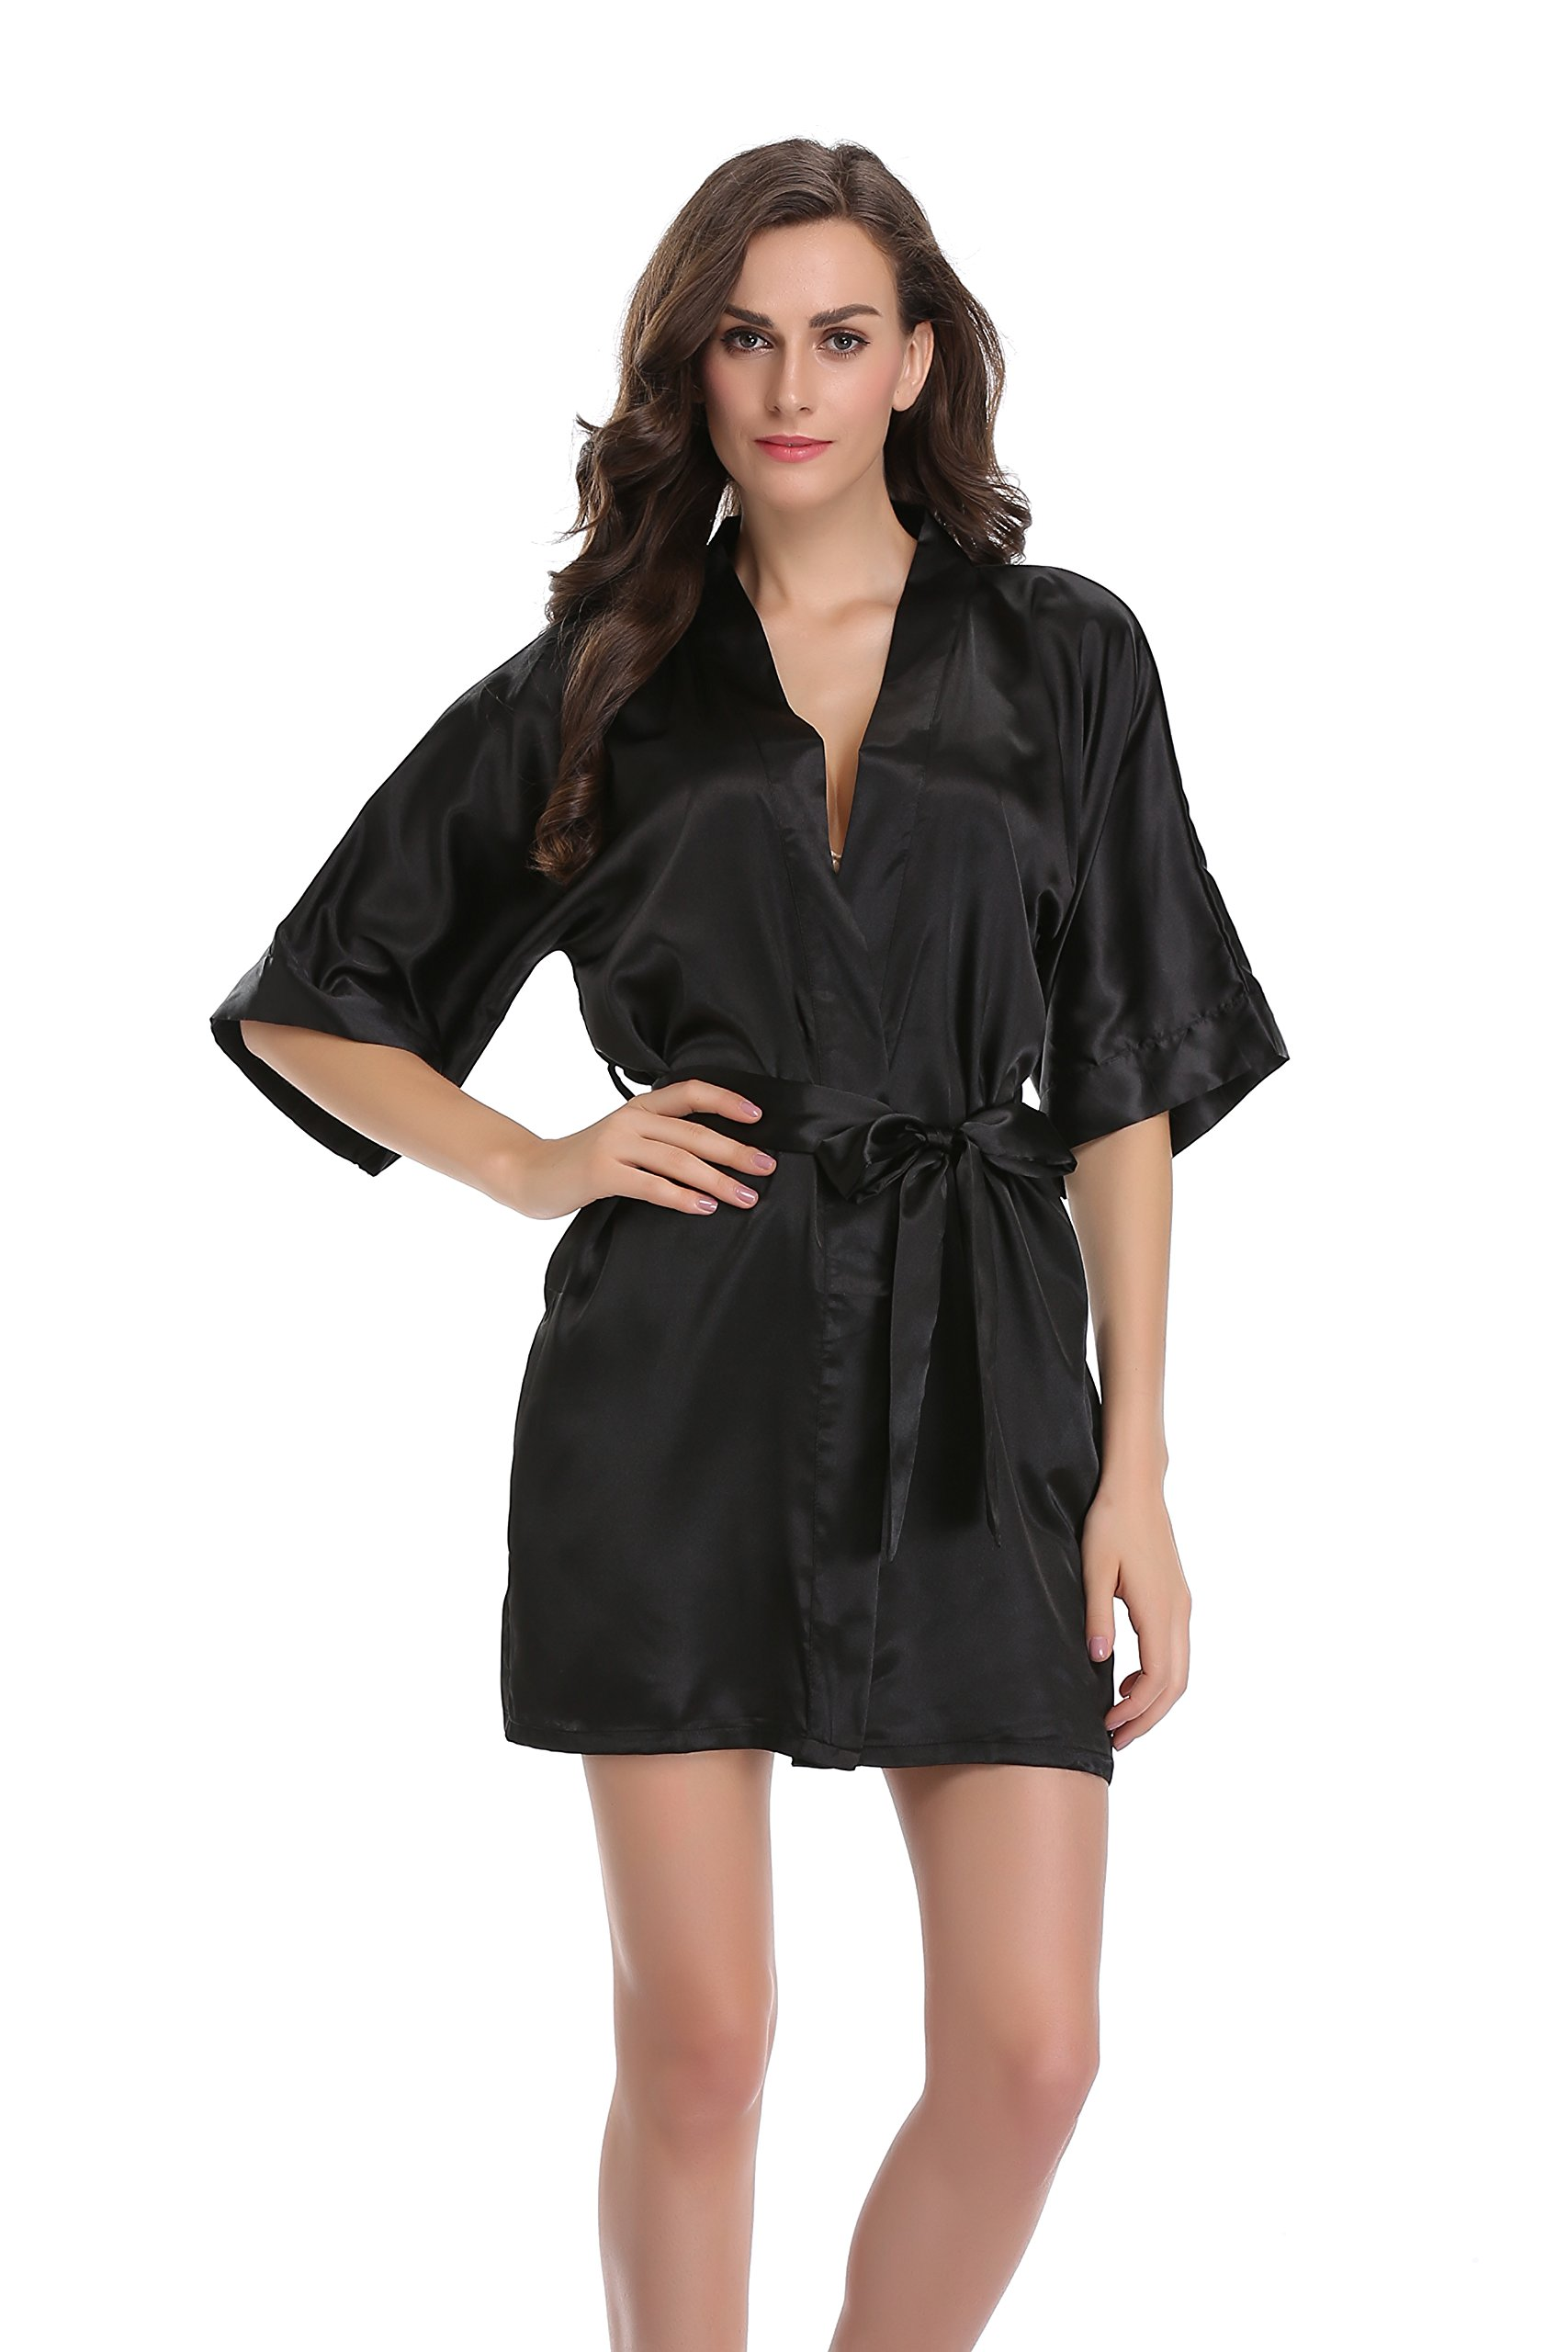 Sunnyhu Women's Pure Color Kimono Robe, Short (S, Black)